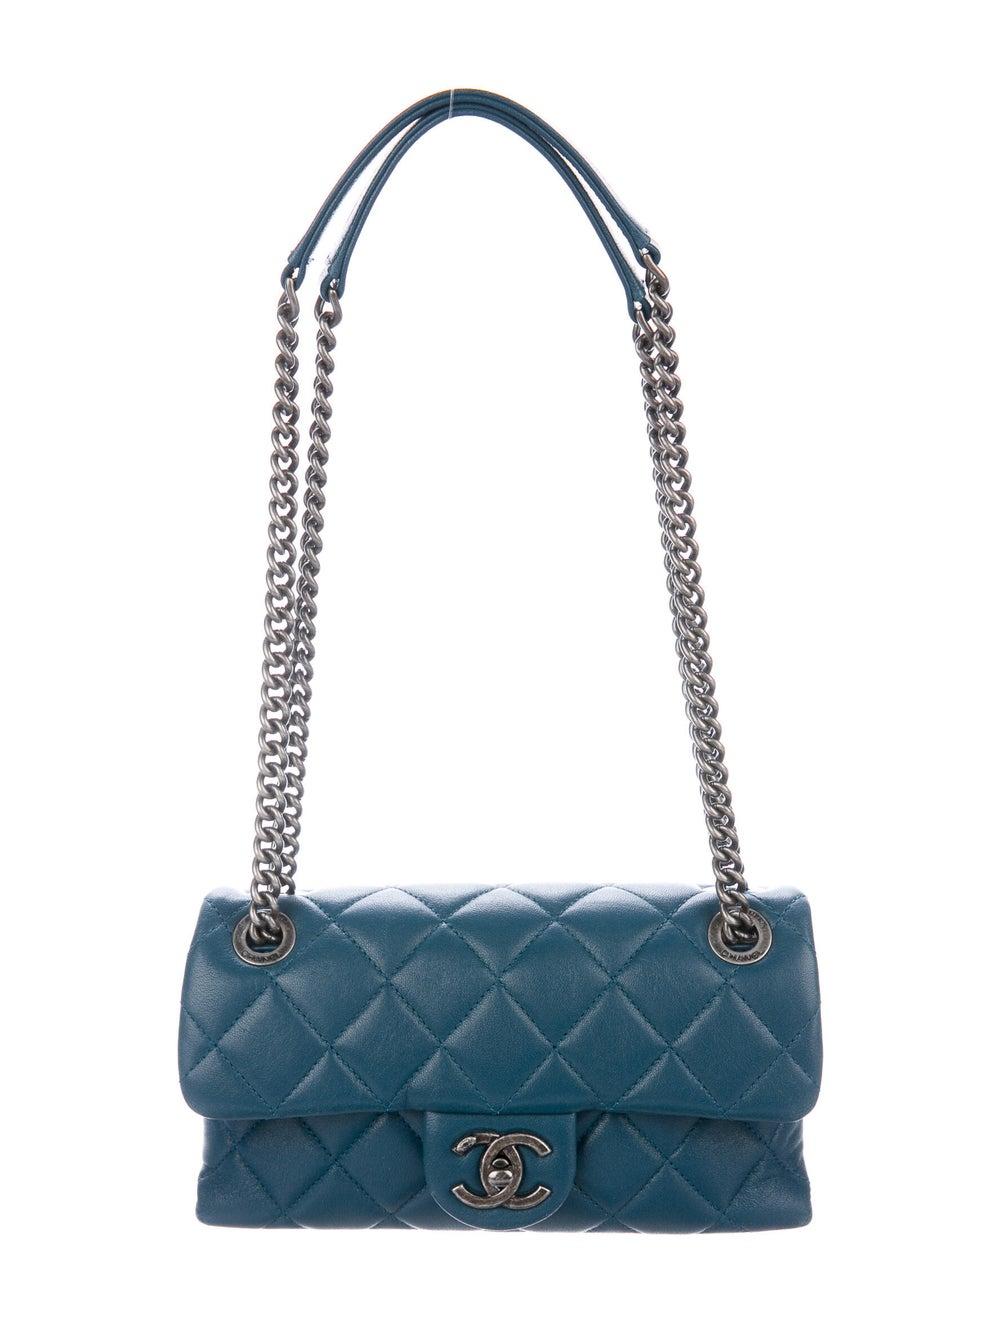 Chanel Small Burgundy Rocks Flap Bag Blue - image 1